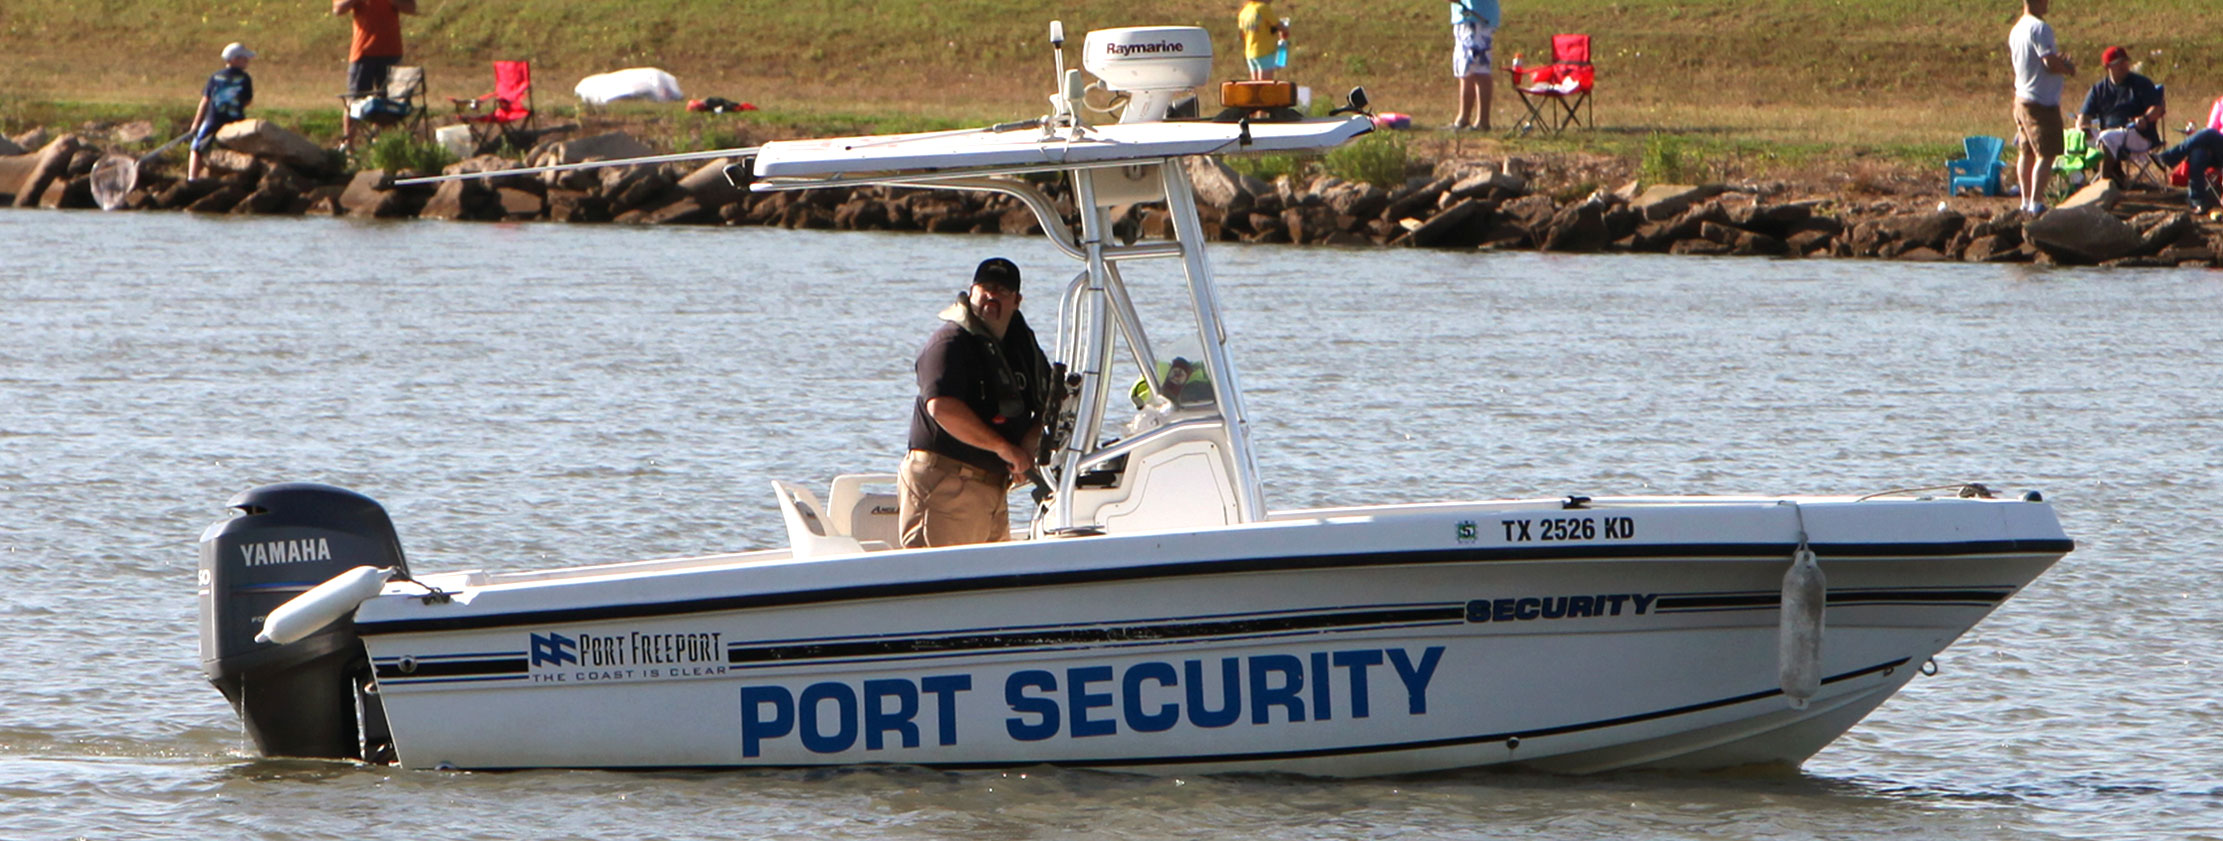 port security at port freeport tx